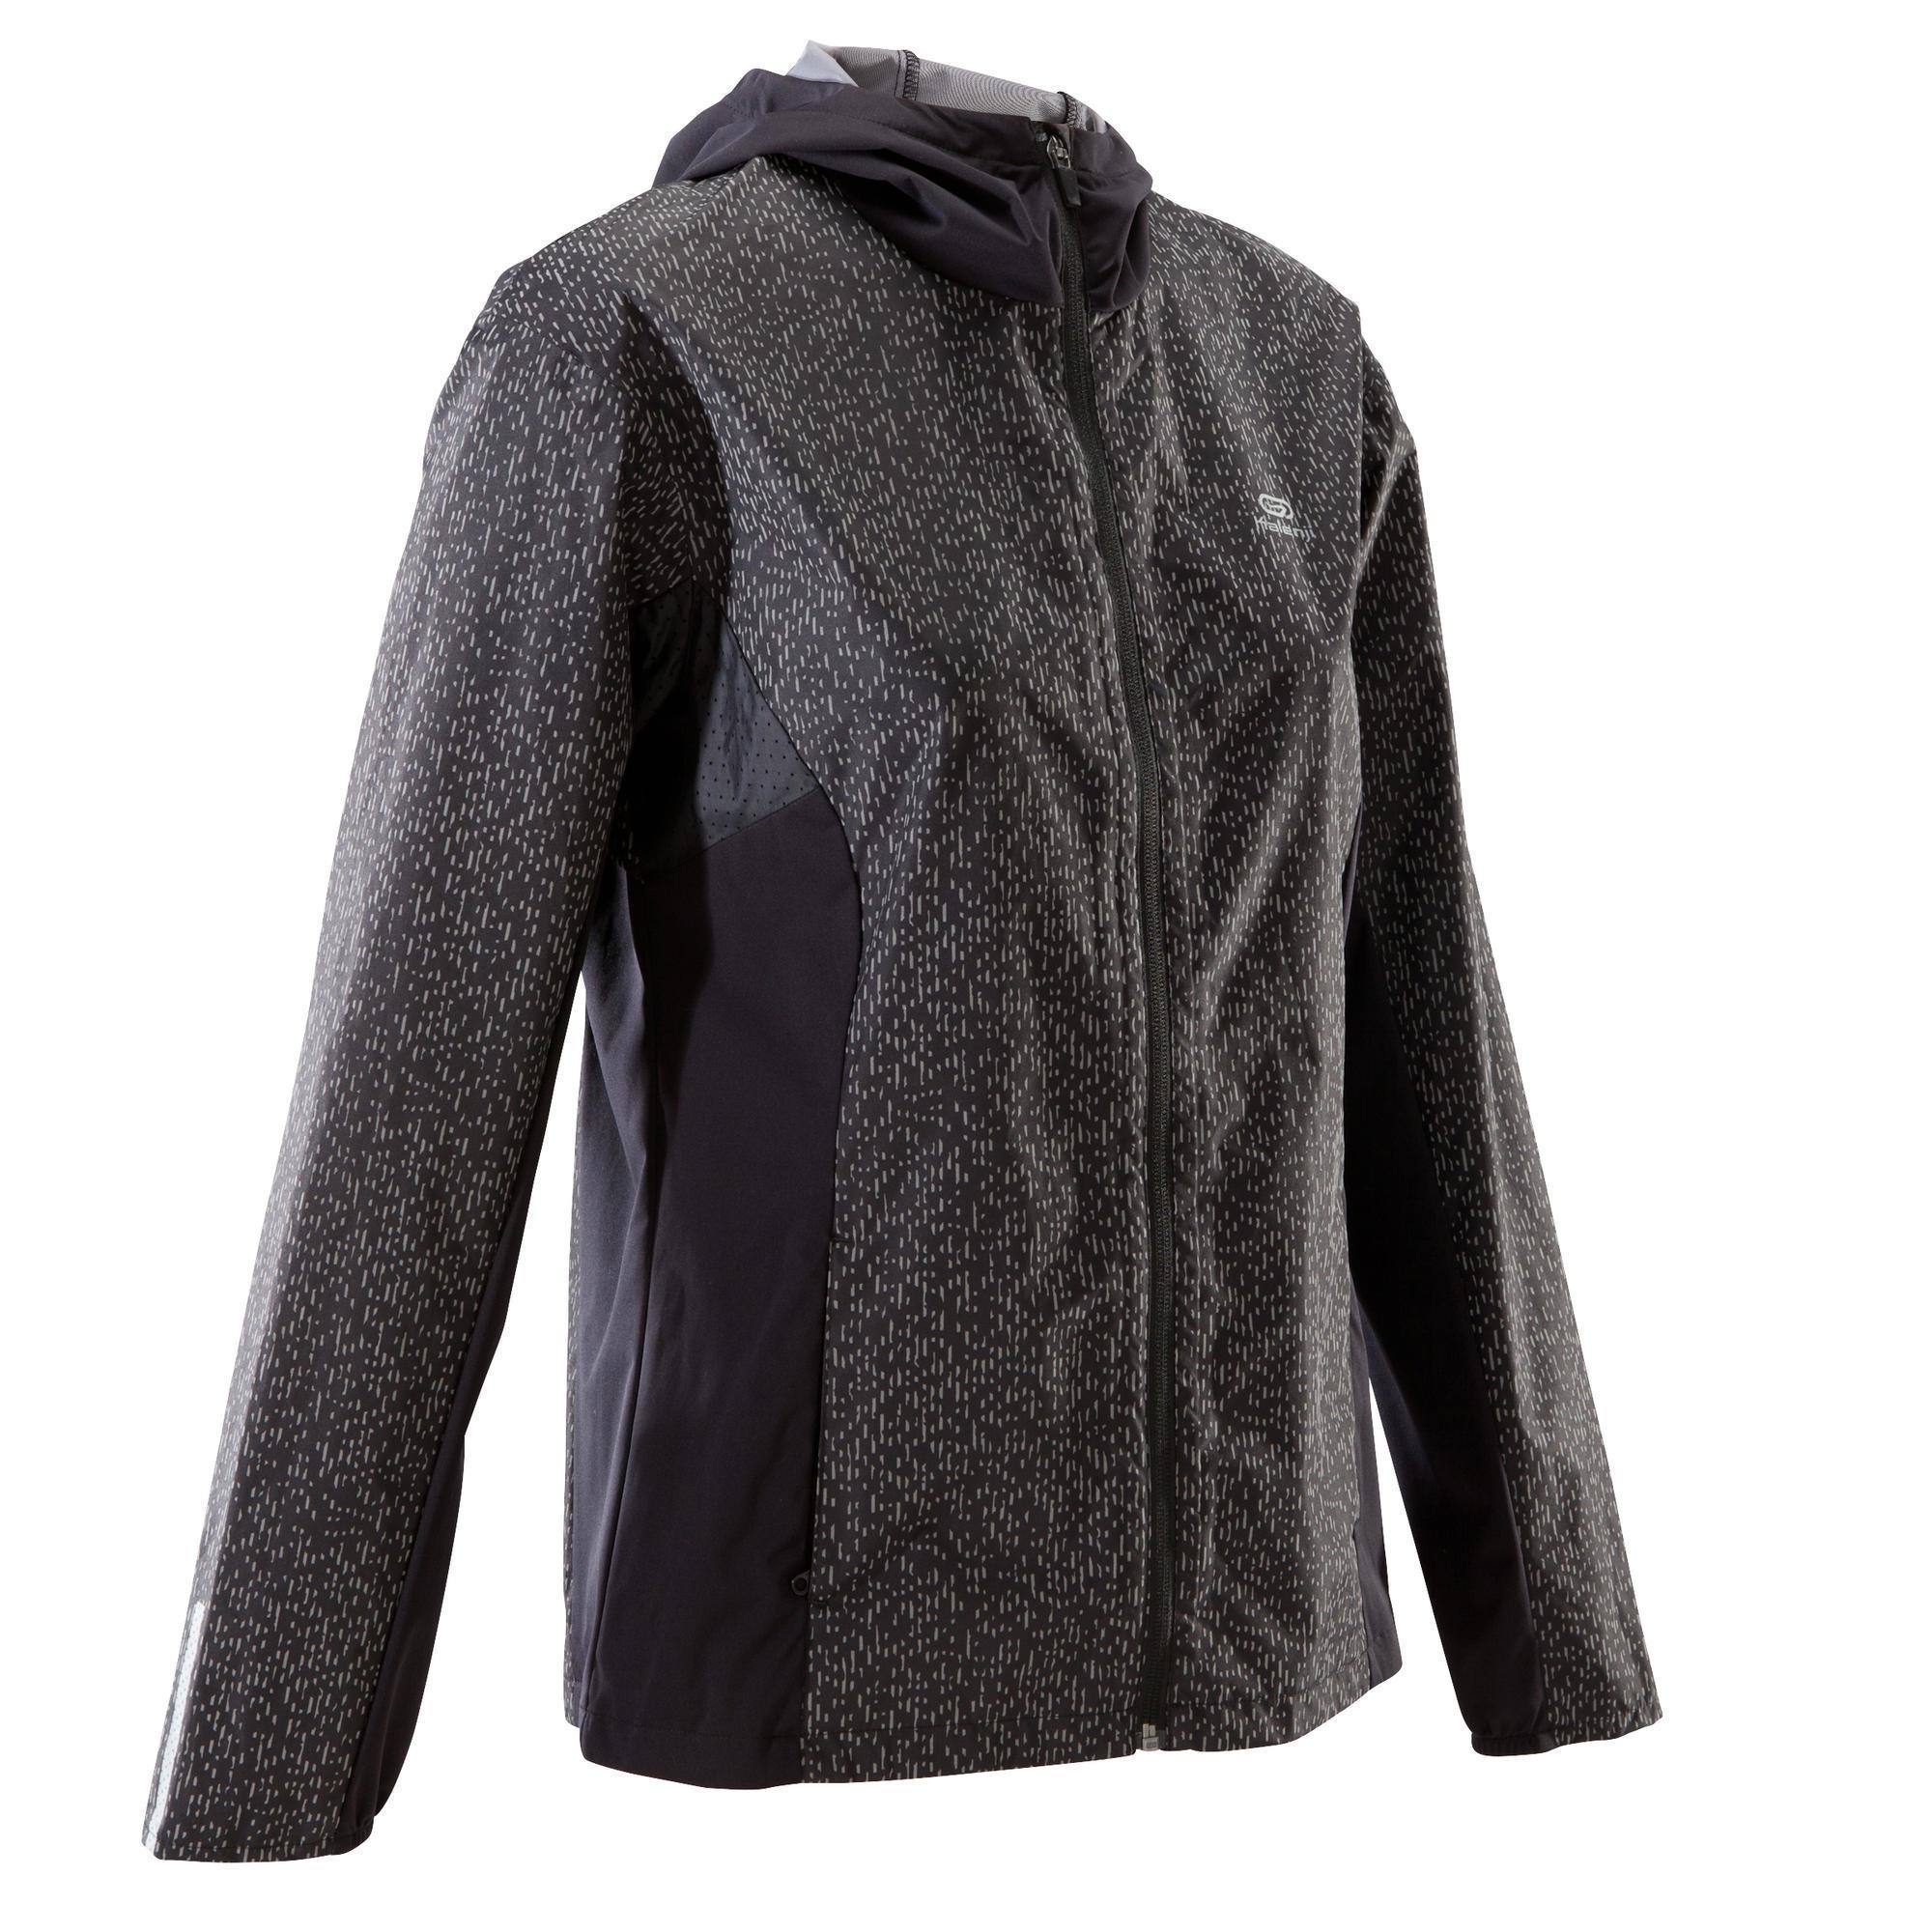 wholesale dealer 96d8a 72eb2 Sportbekleidung Damen   Günstige Preise   DECATHLON